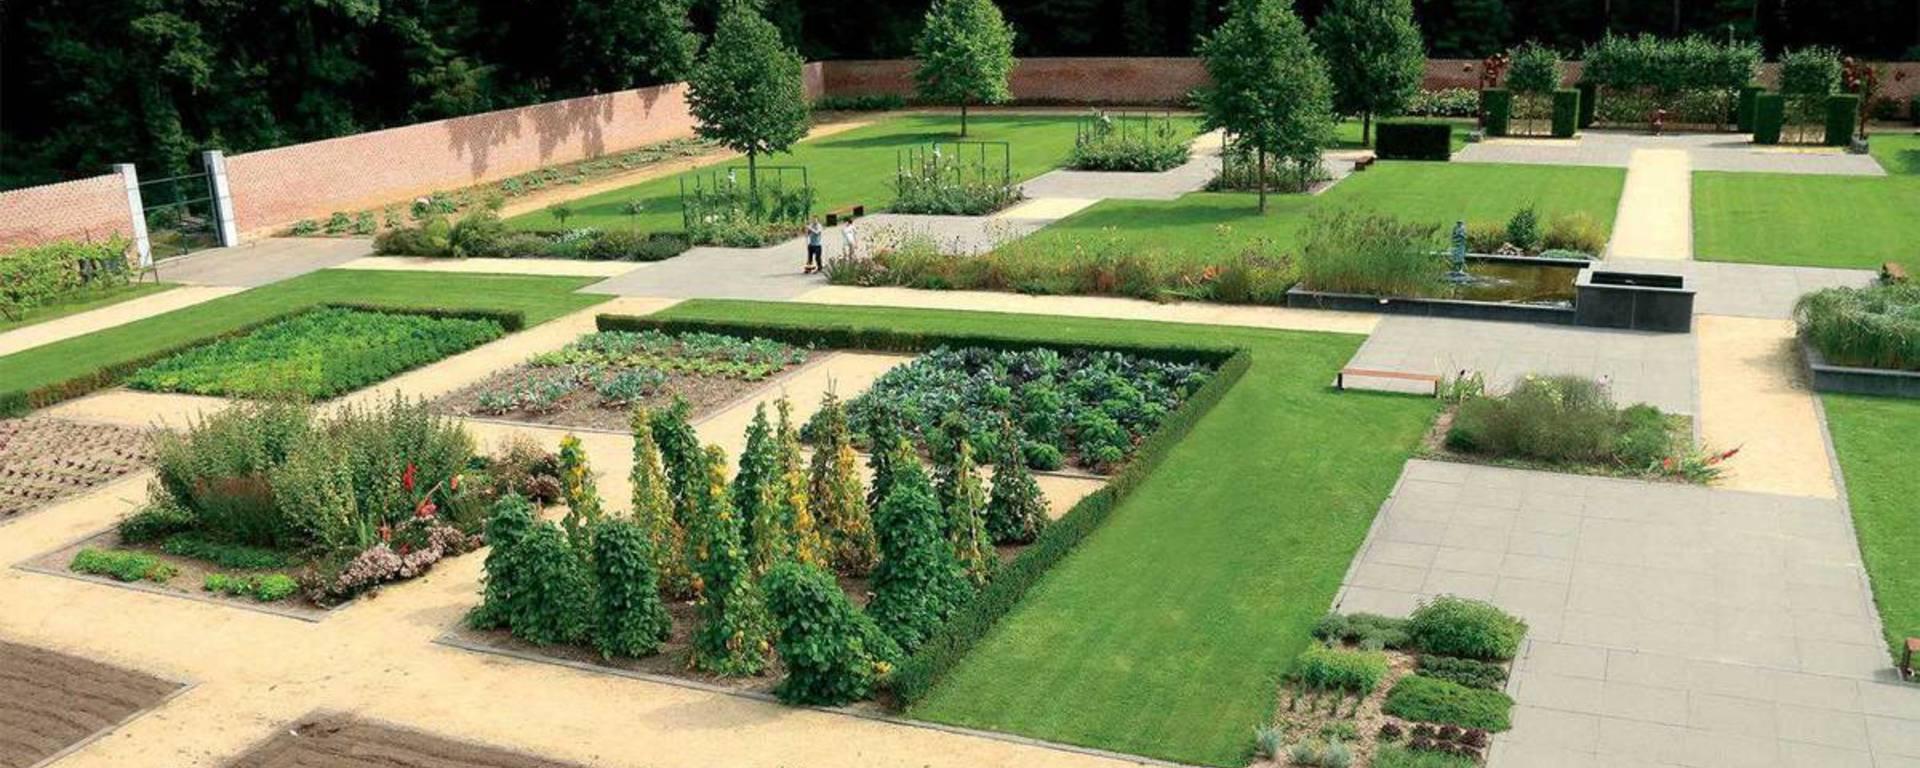 Jehay castle vegetable garden